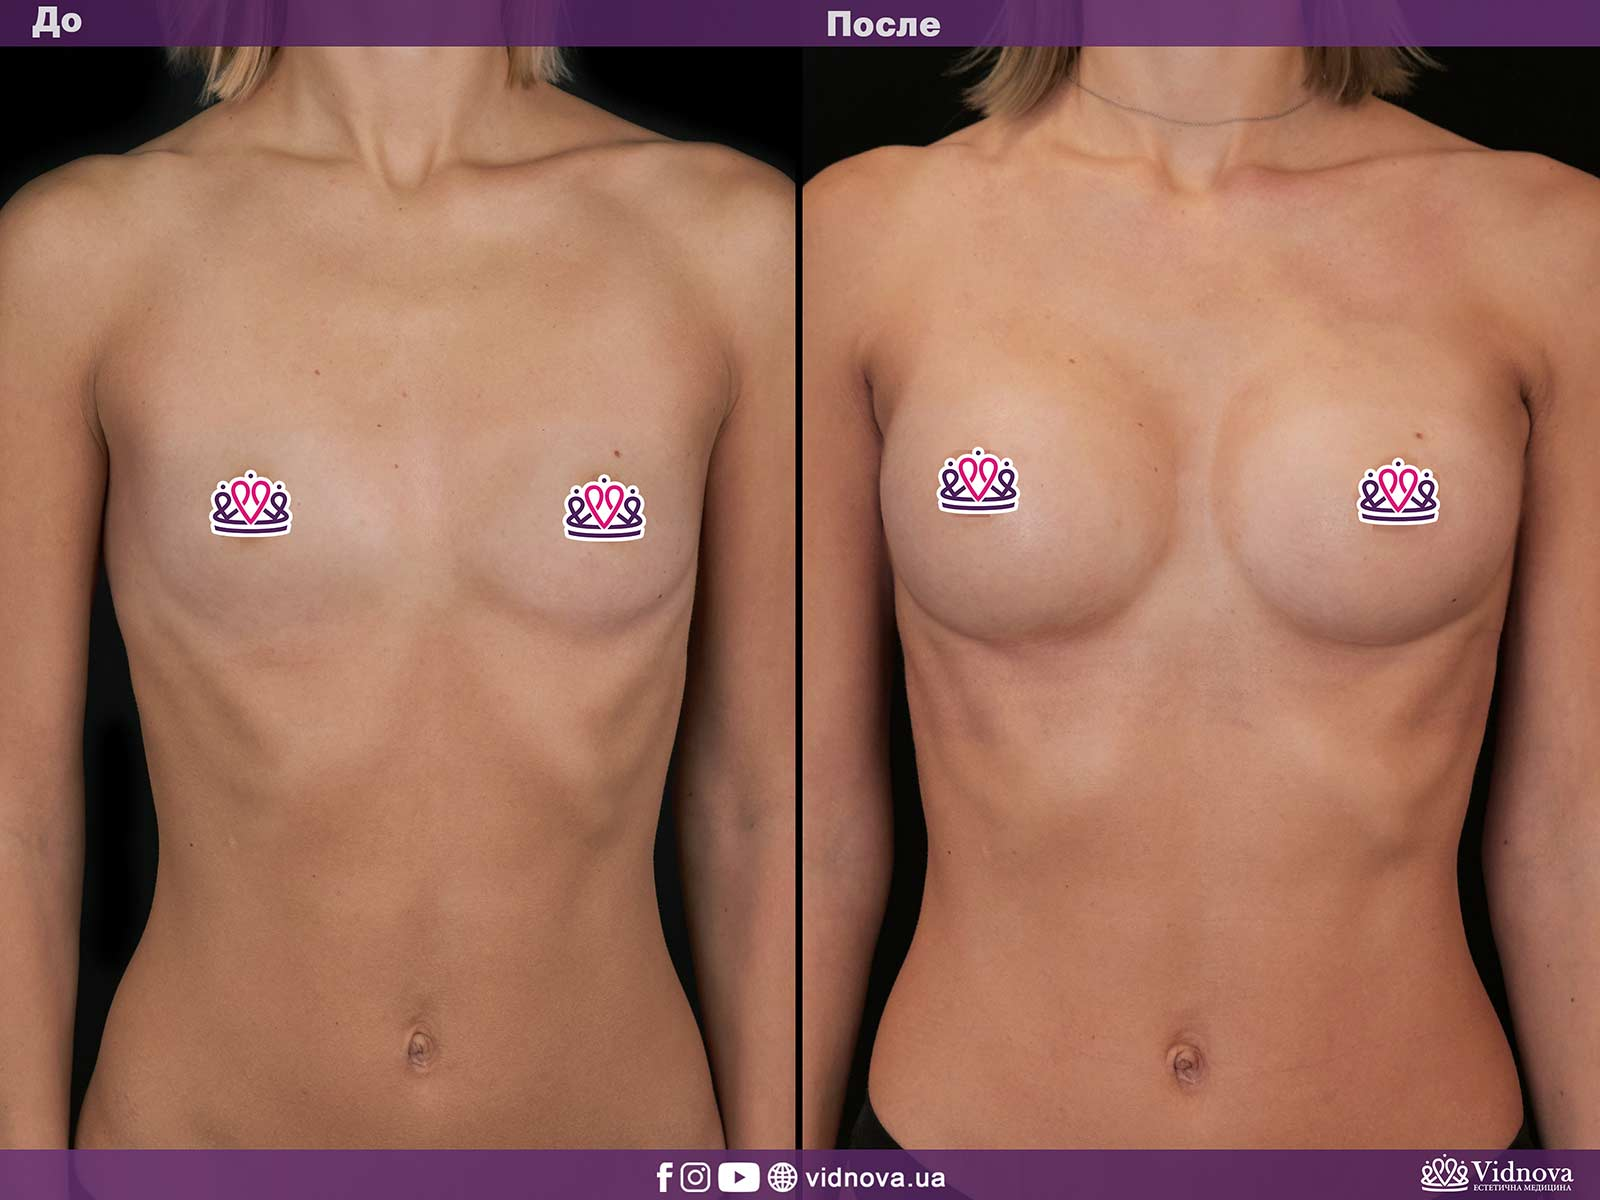 Увеличение груди: Фото ДО и ПОСЛЕ - Пример №13-1 - Клиника Vidnova